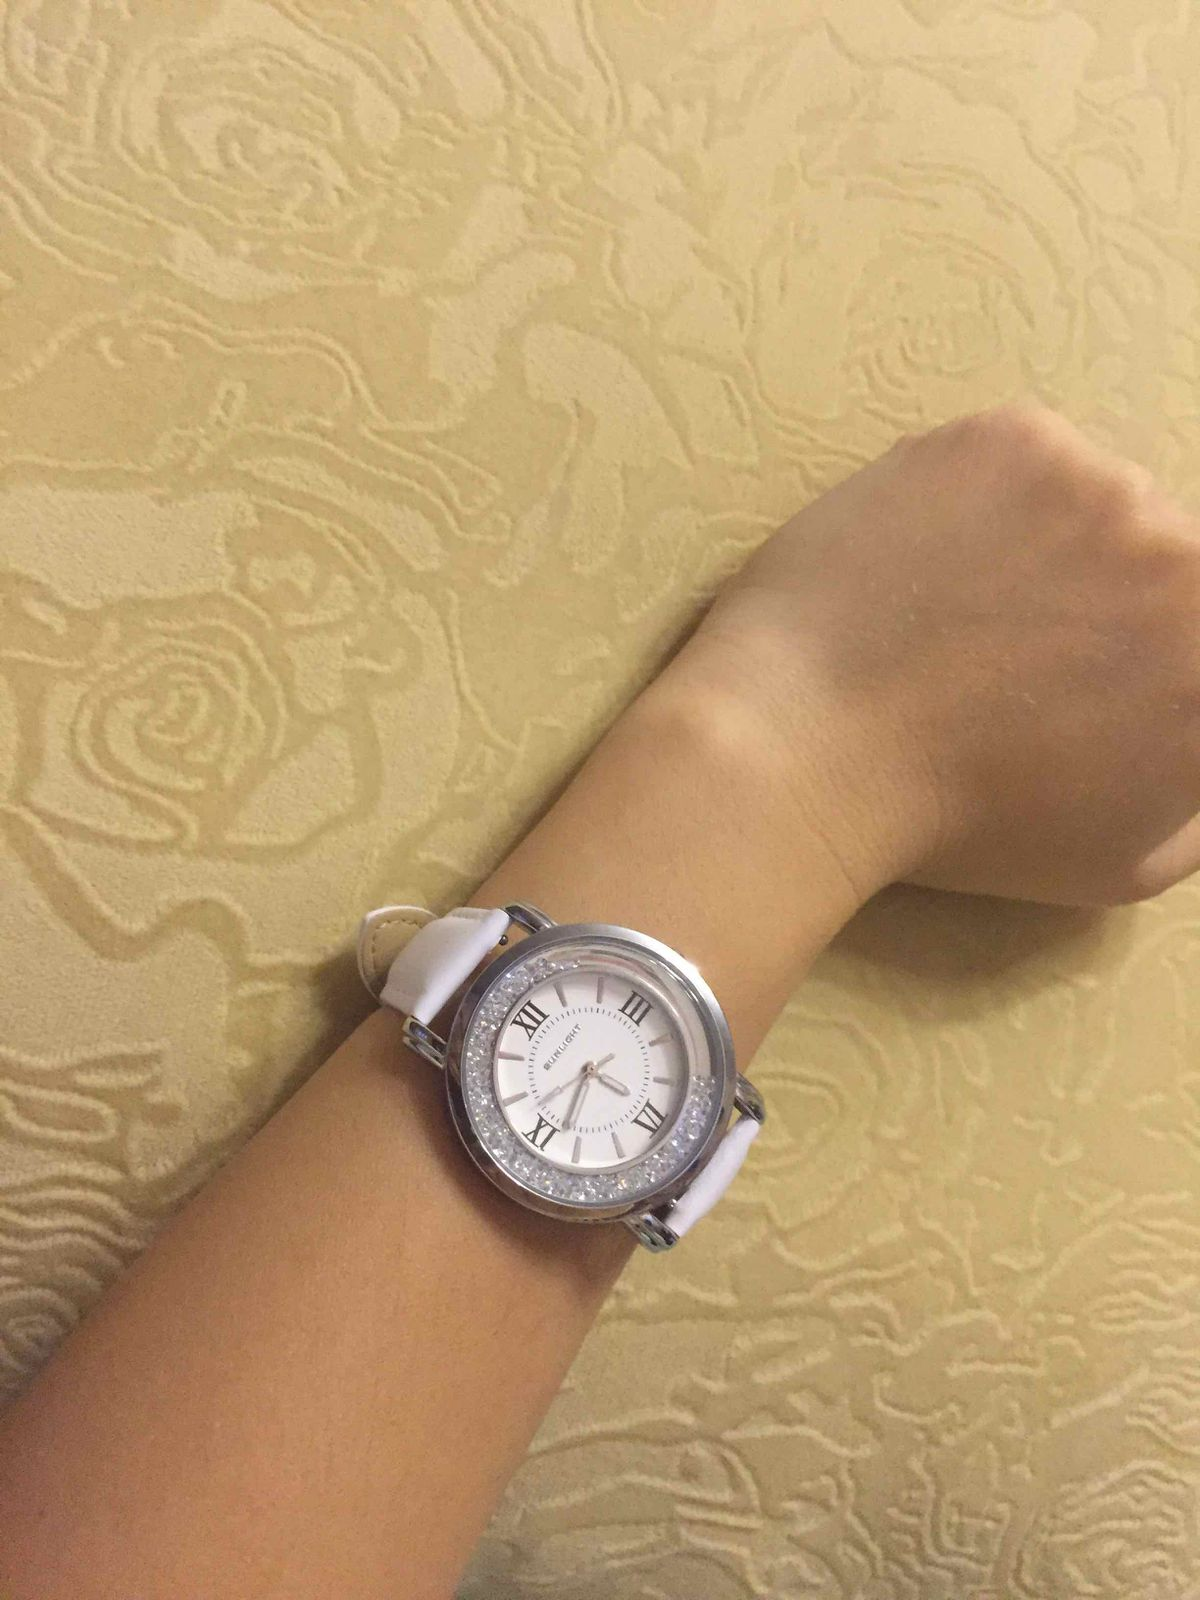 Удобные простые часы